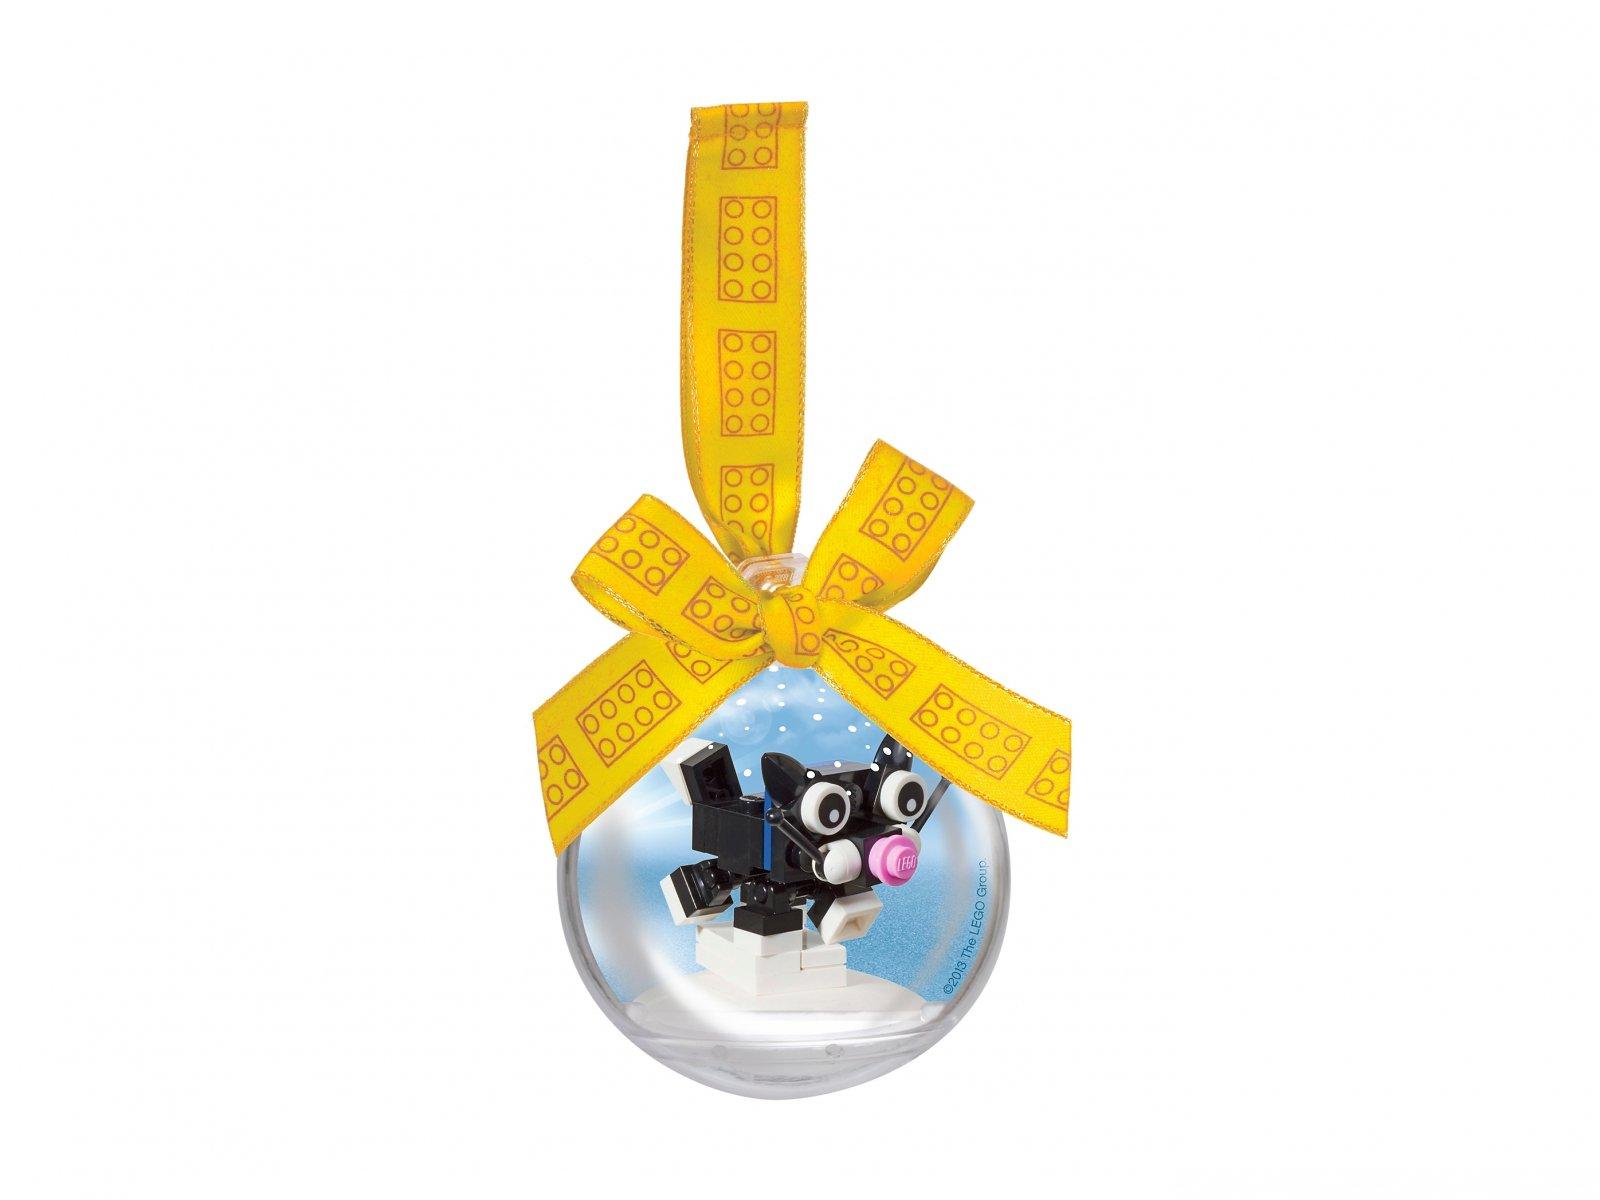 LEGO Creator 850950 Christmas Cat Ornament